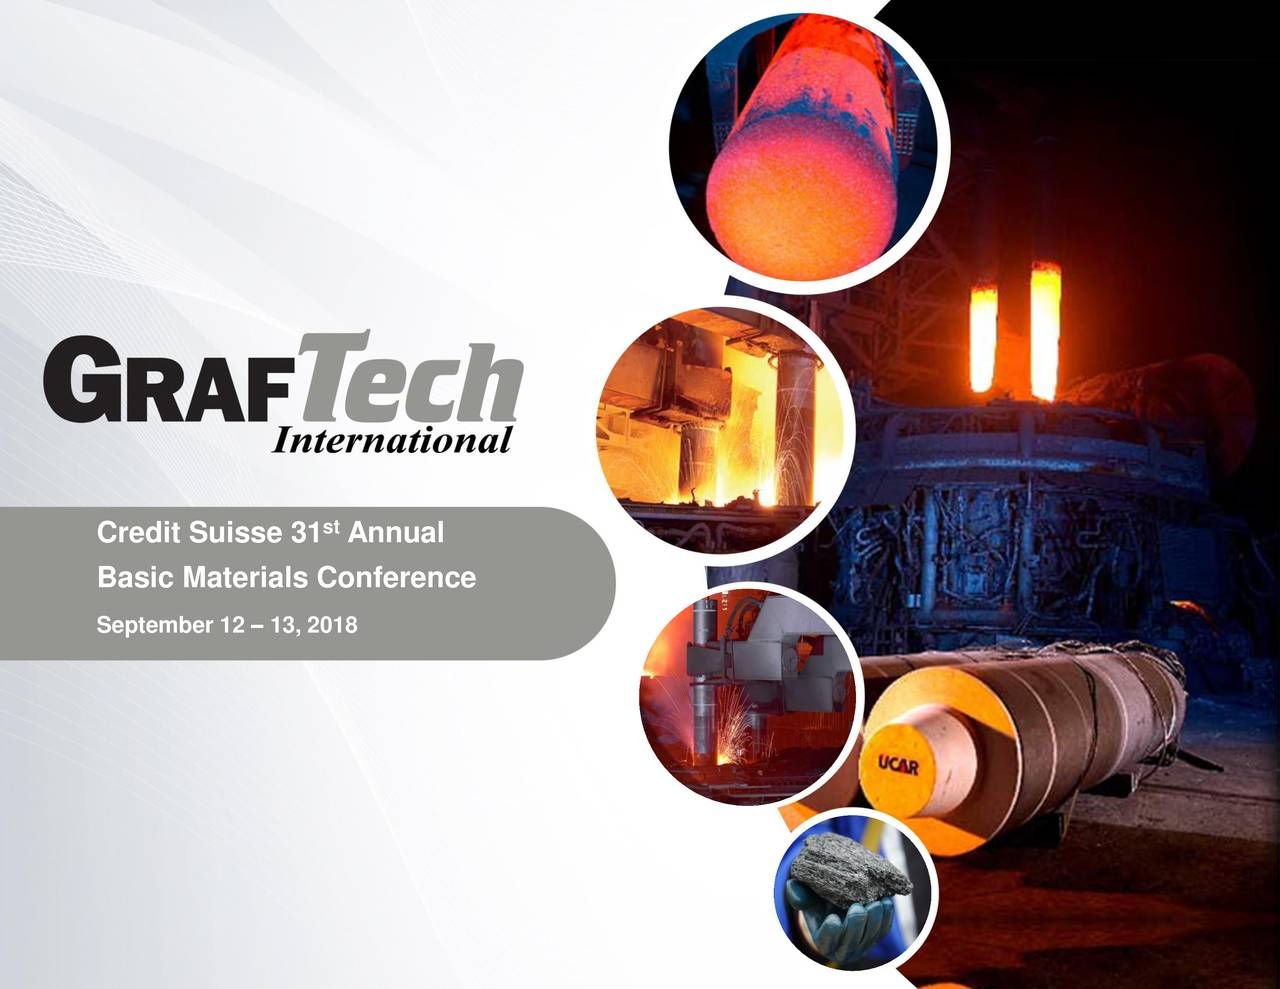 Basic Materials Conference September 12 – 13, 2018